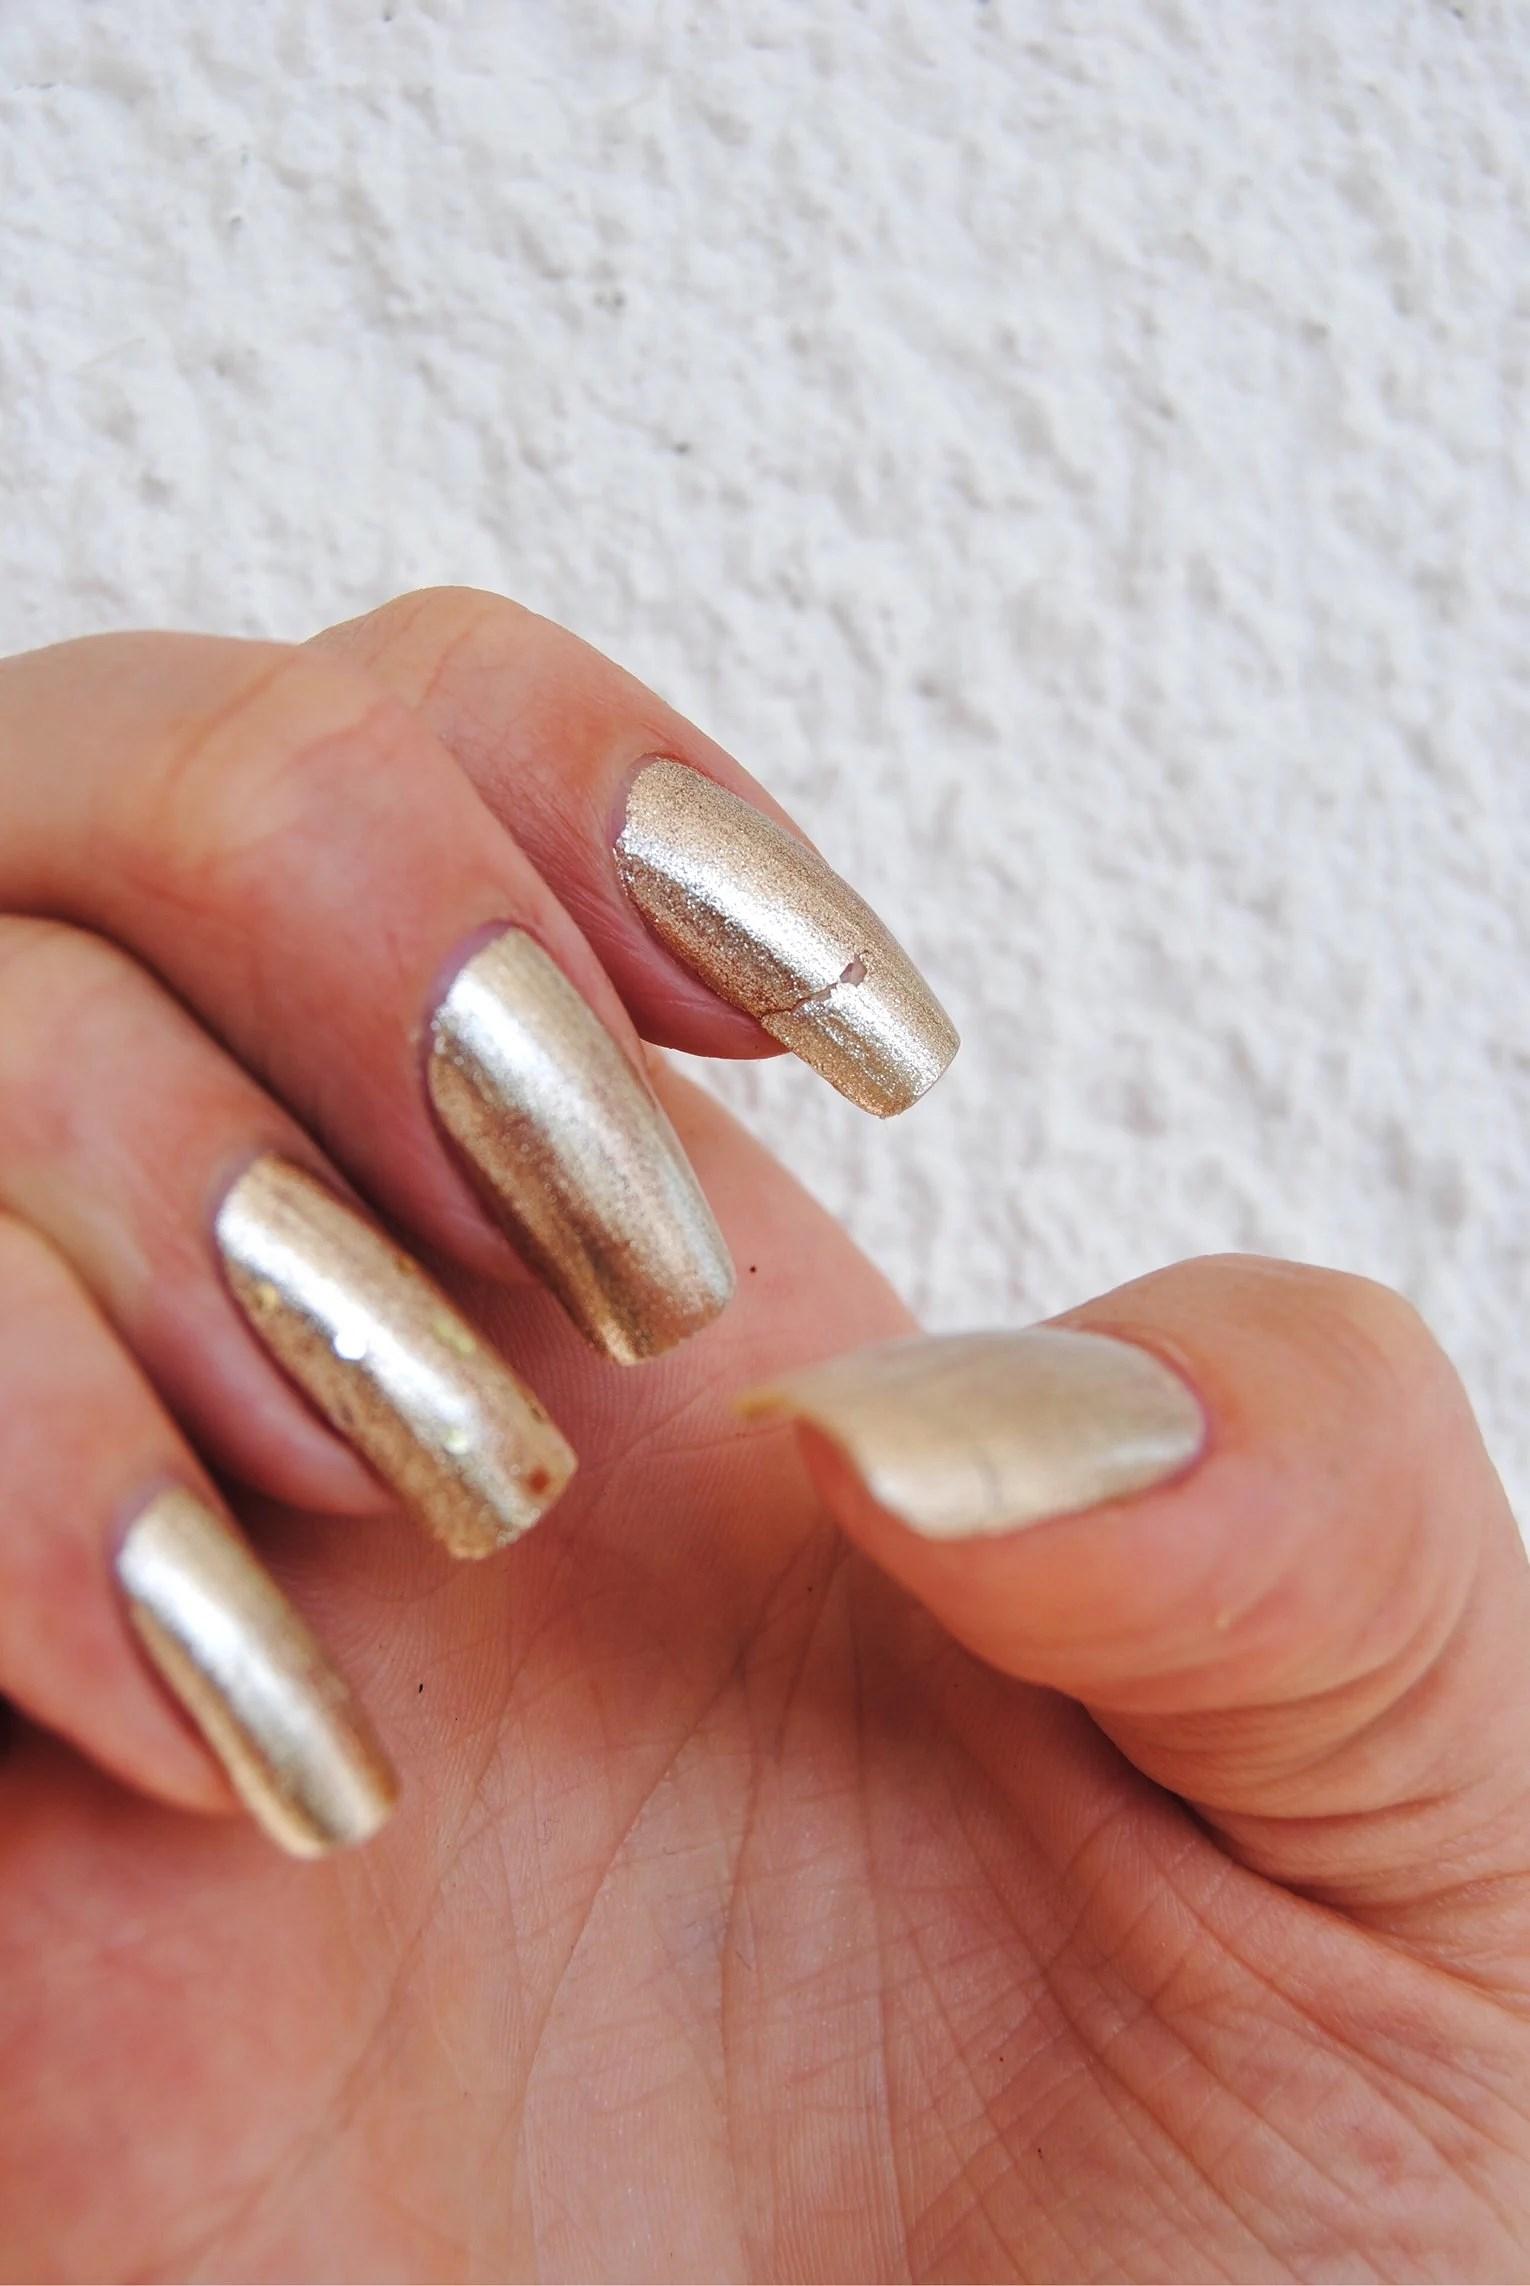 Golden stuff